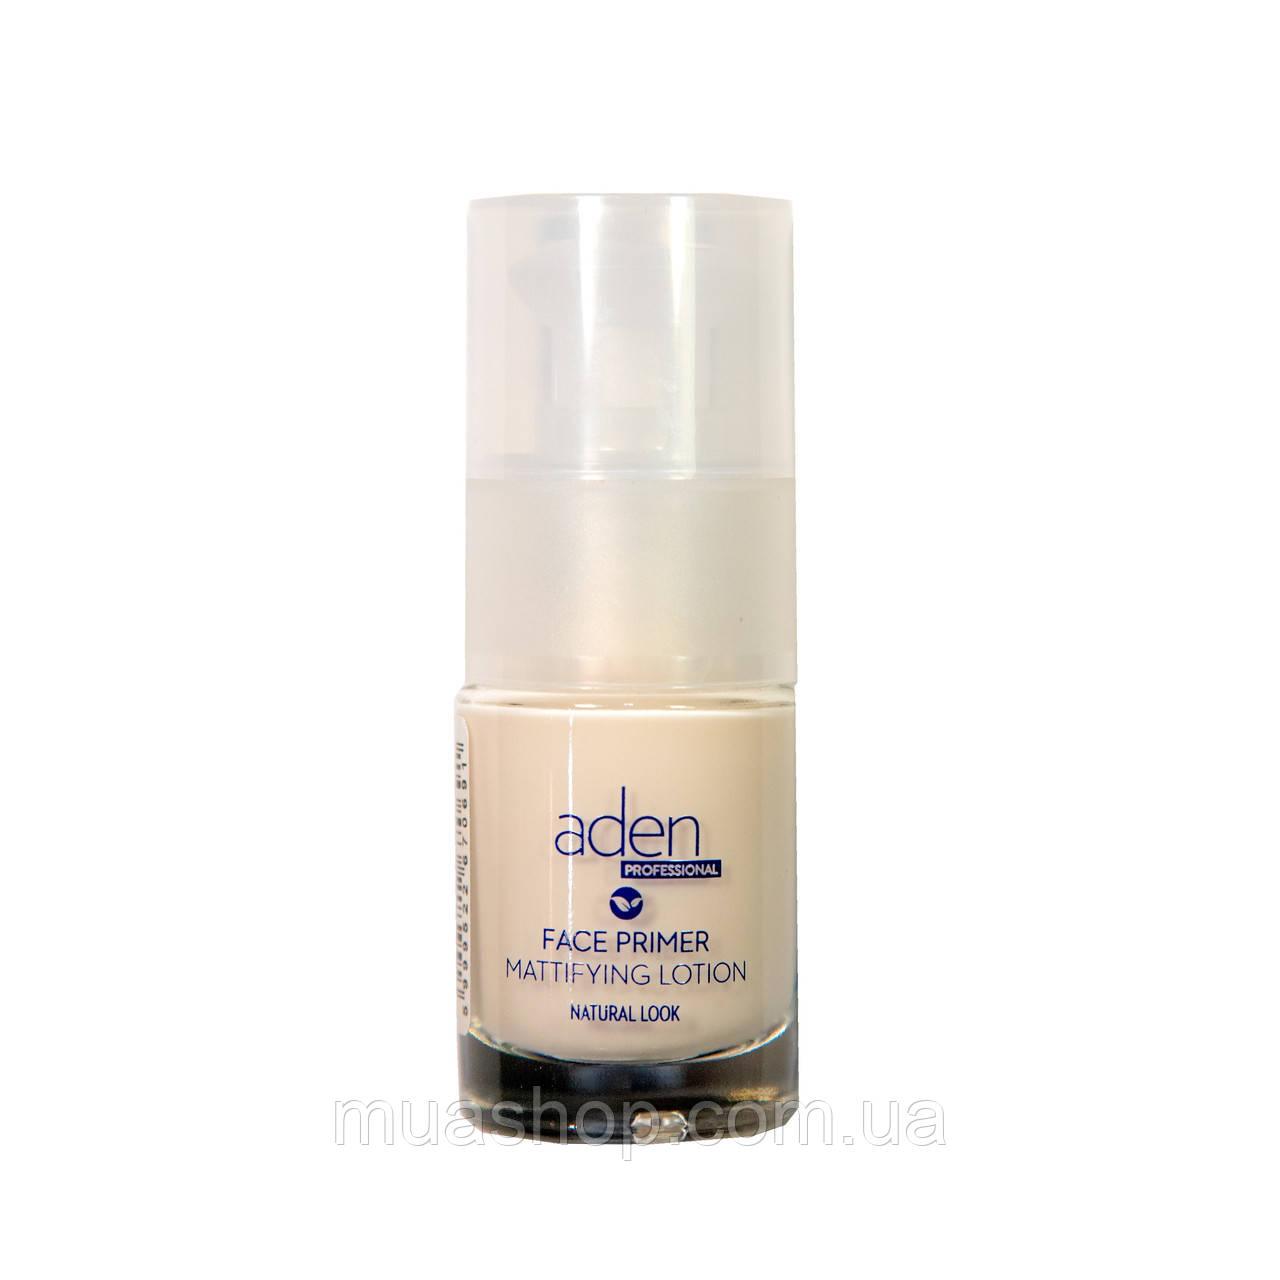 Aden Основа под макияж 069  Primer for Face Mattifying Lotion 15 ml